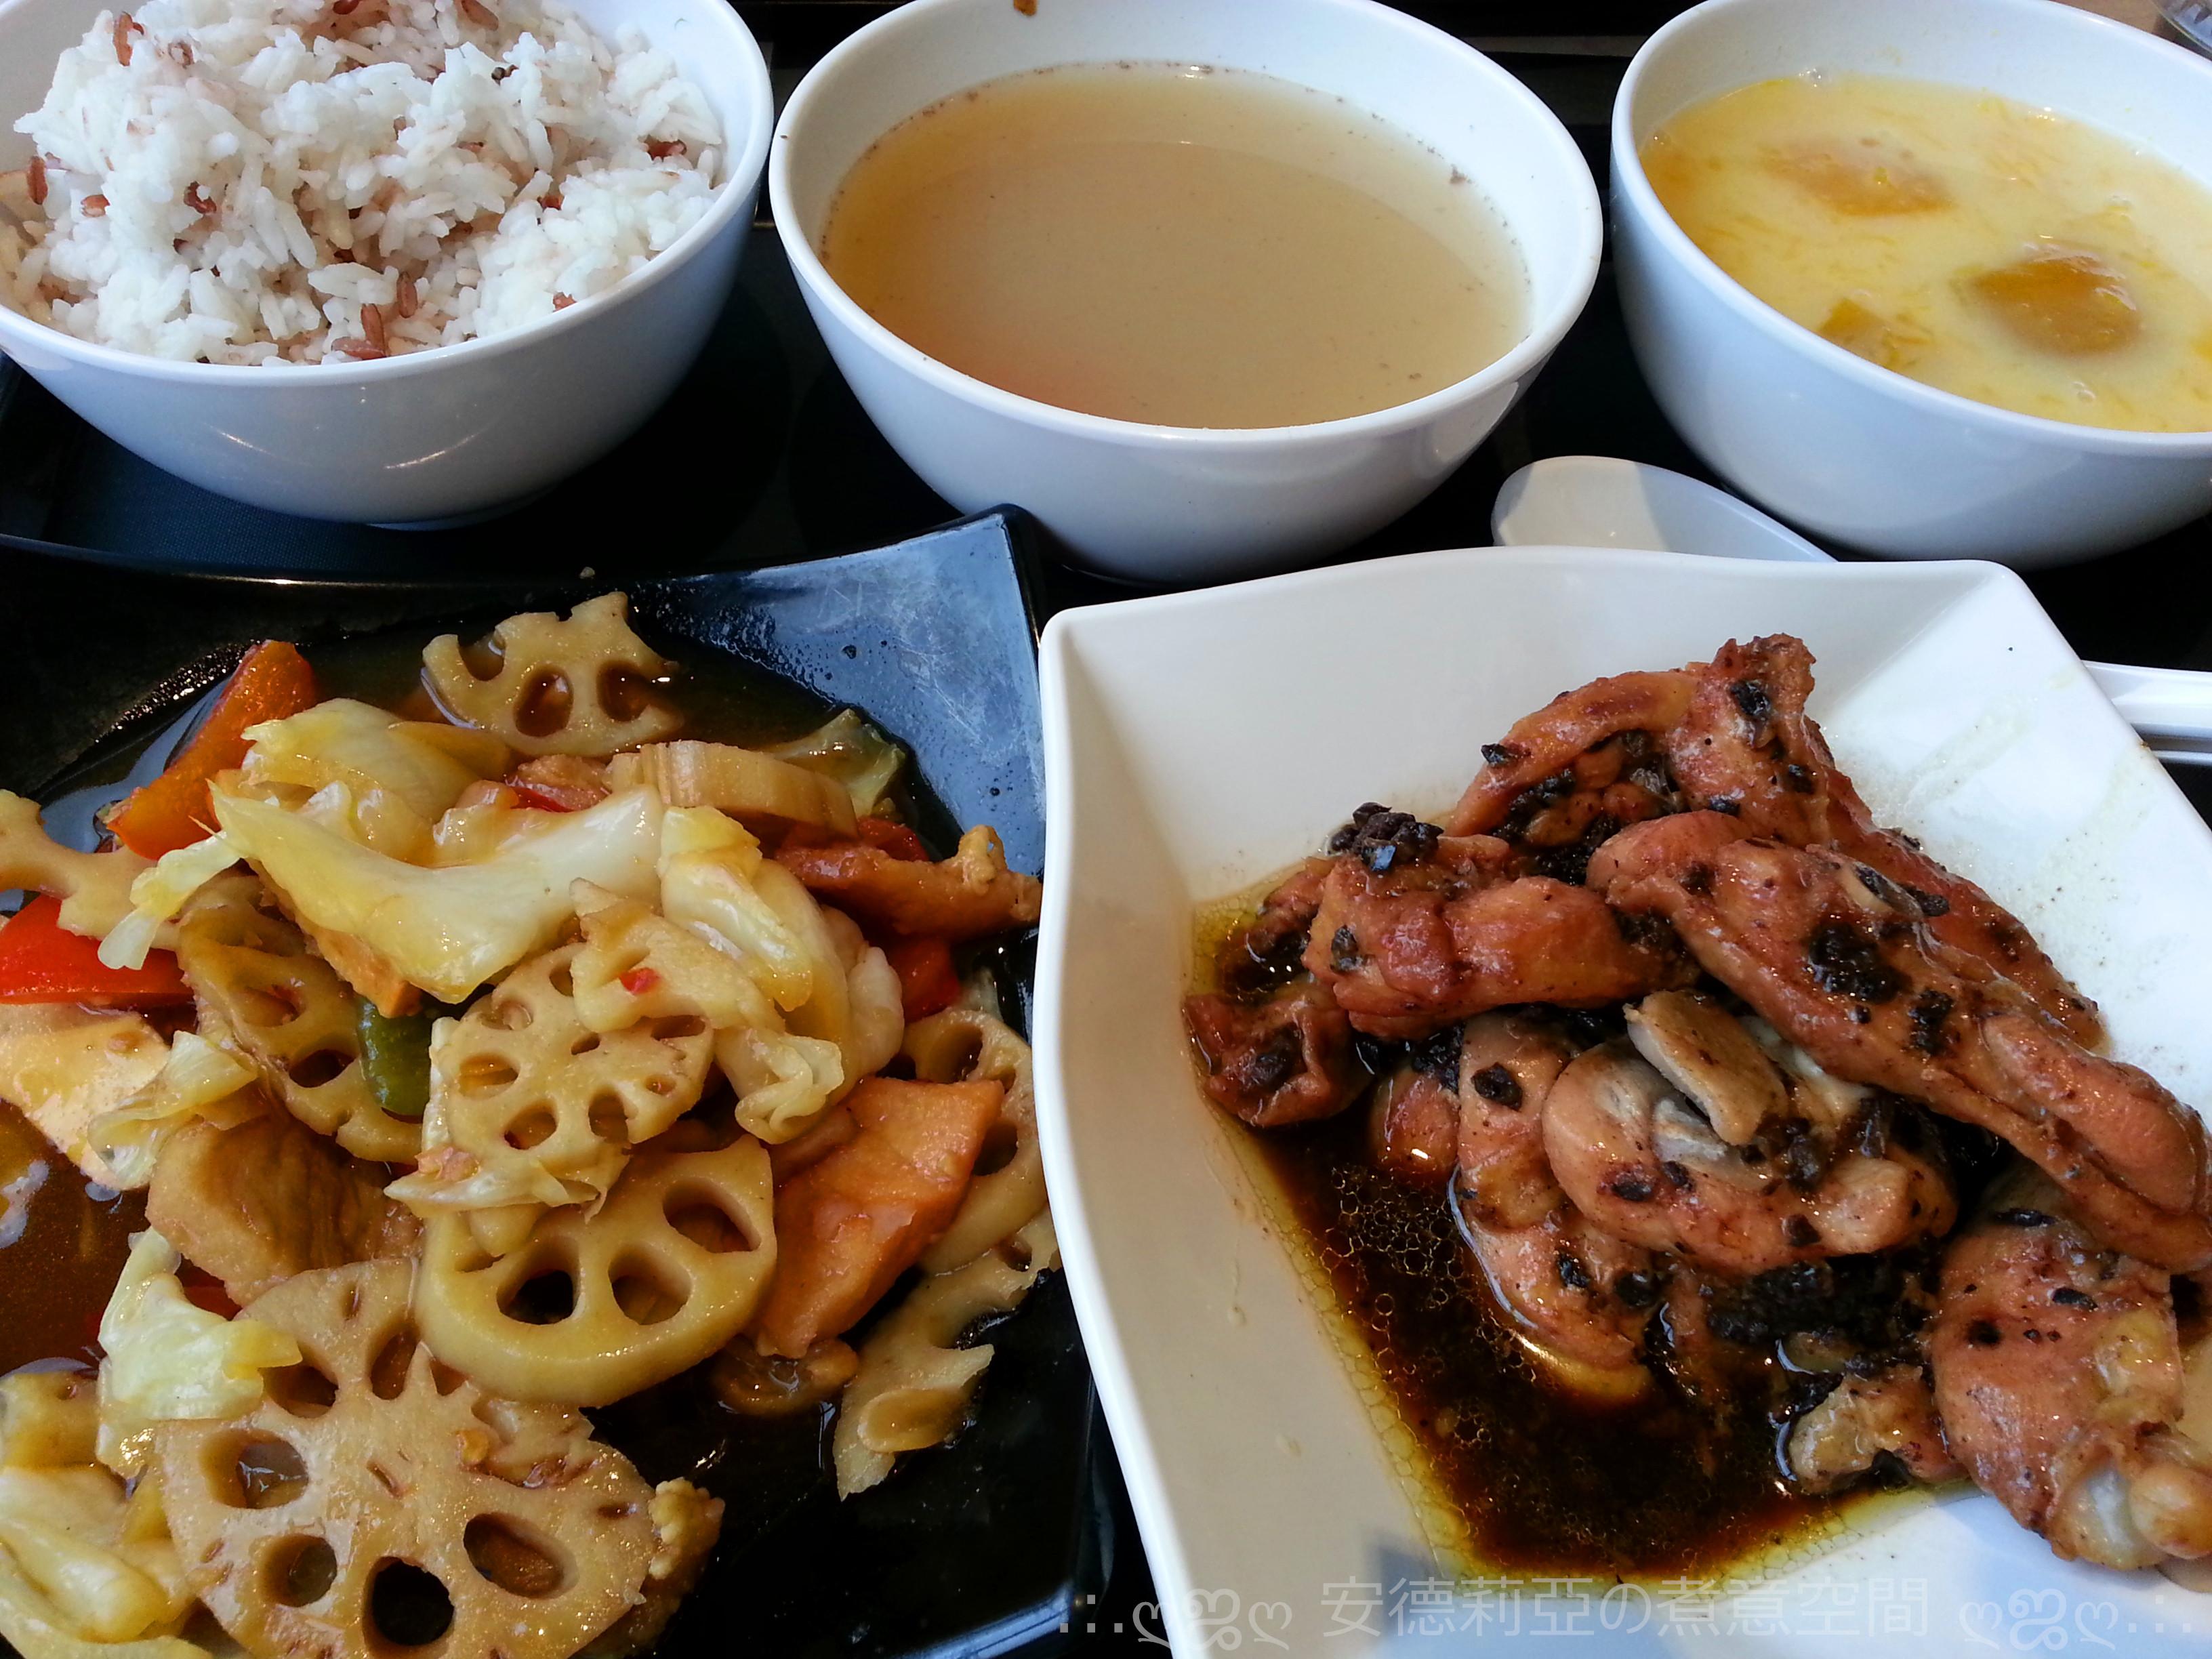 【Oriental】 ツ | .:.ღஜღ 安德莉亞の煮意空間 ღஜღ.:. | Page 12